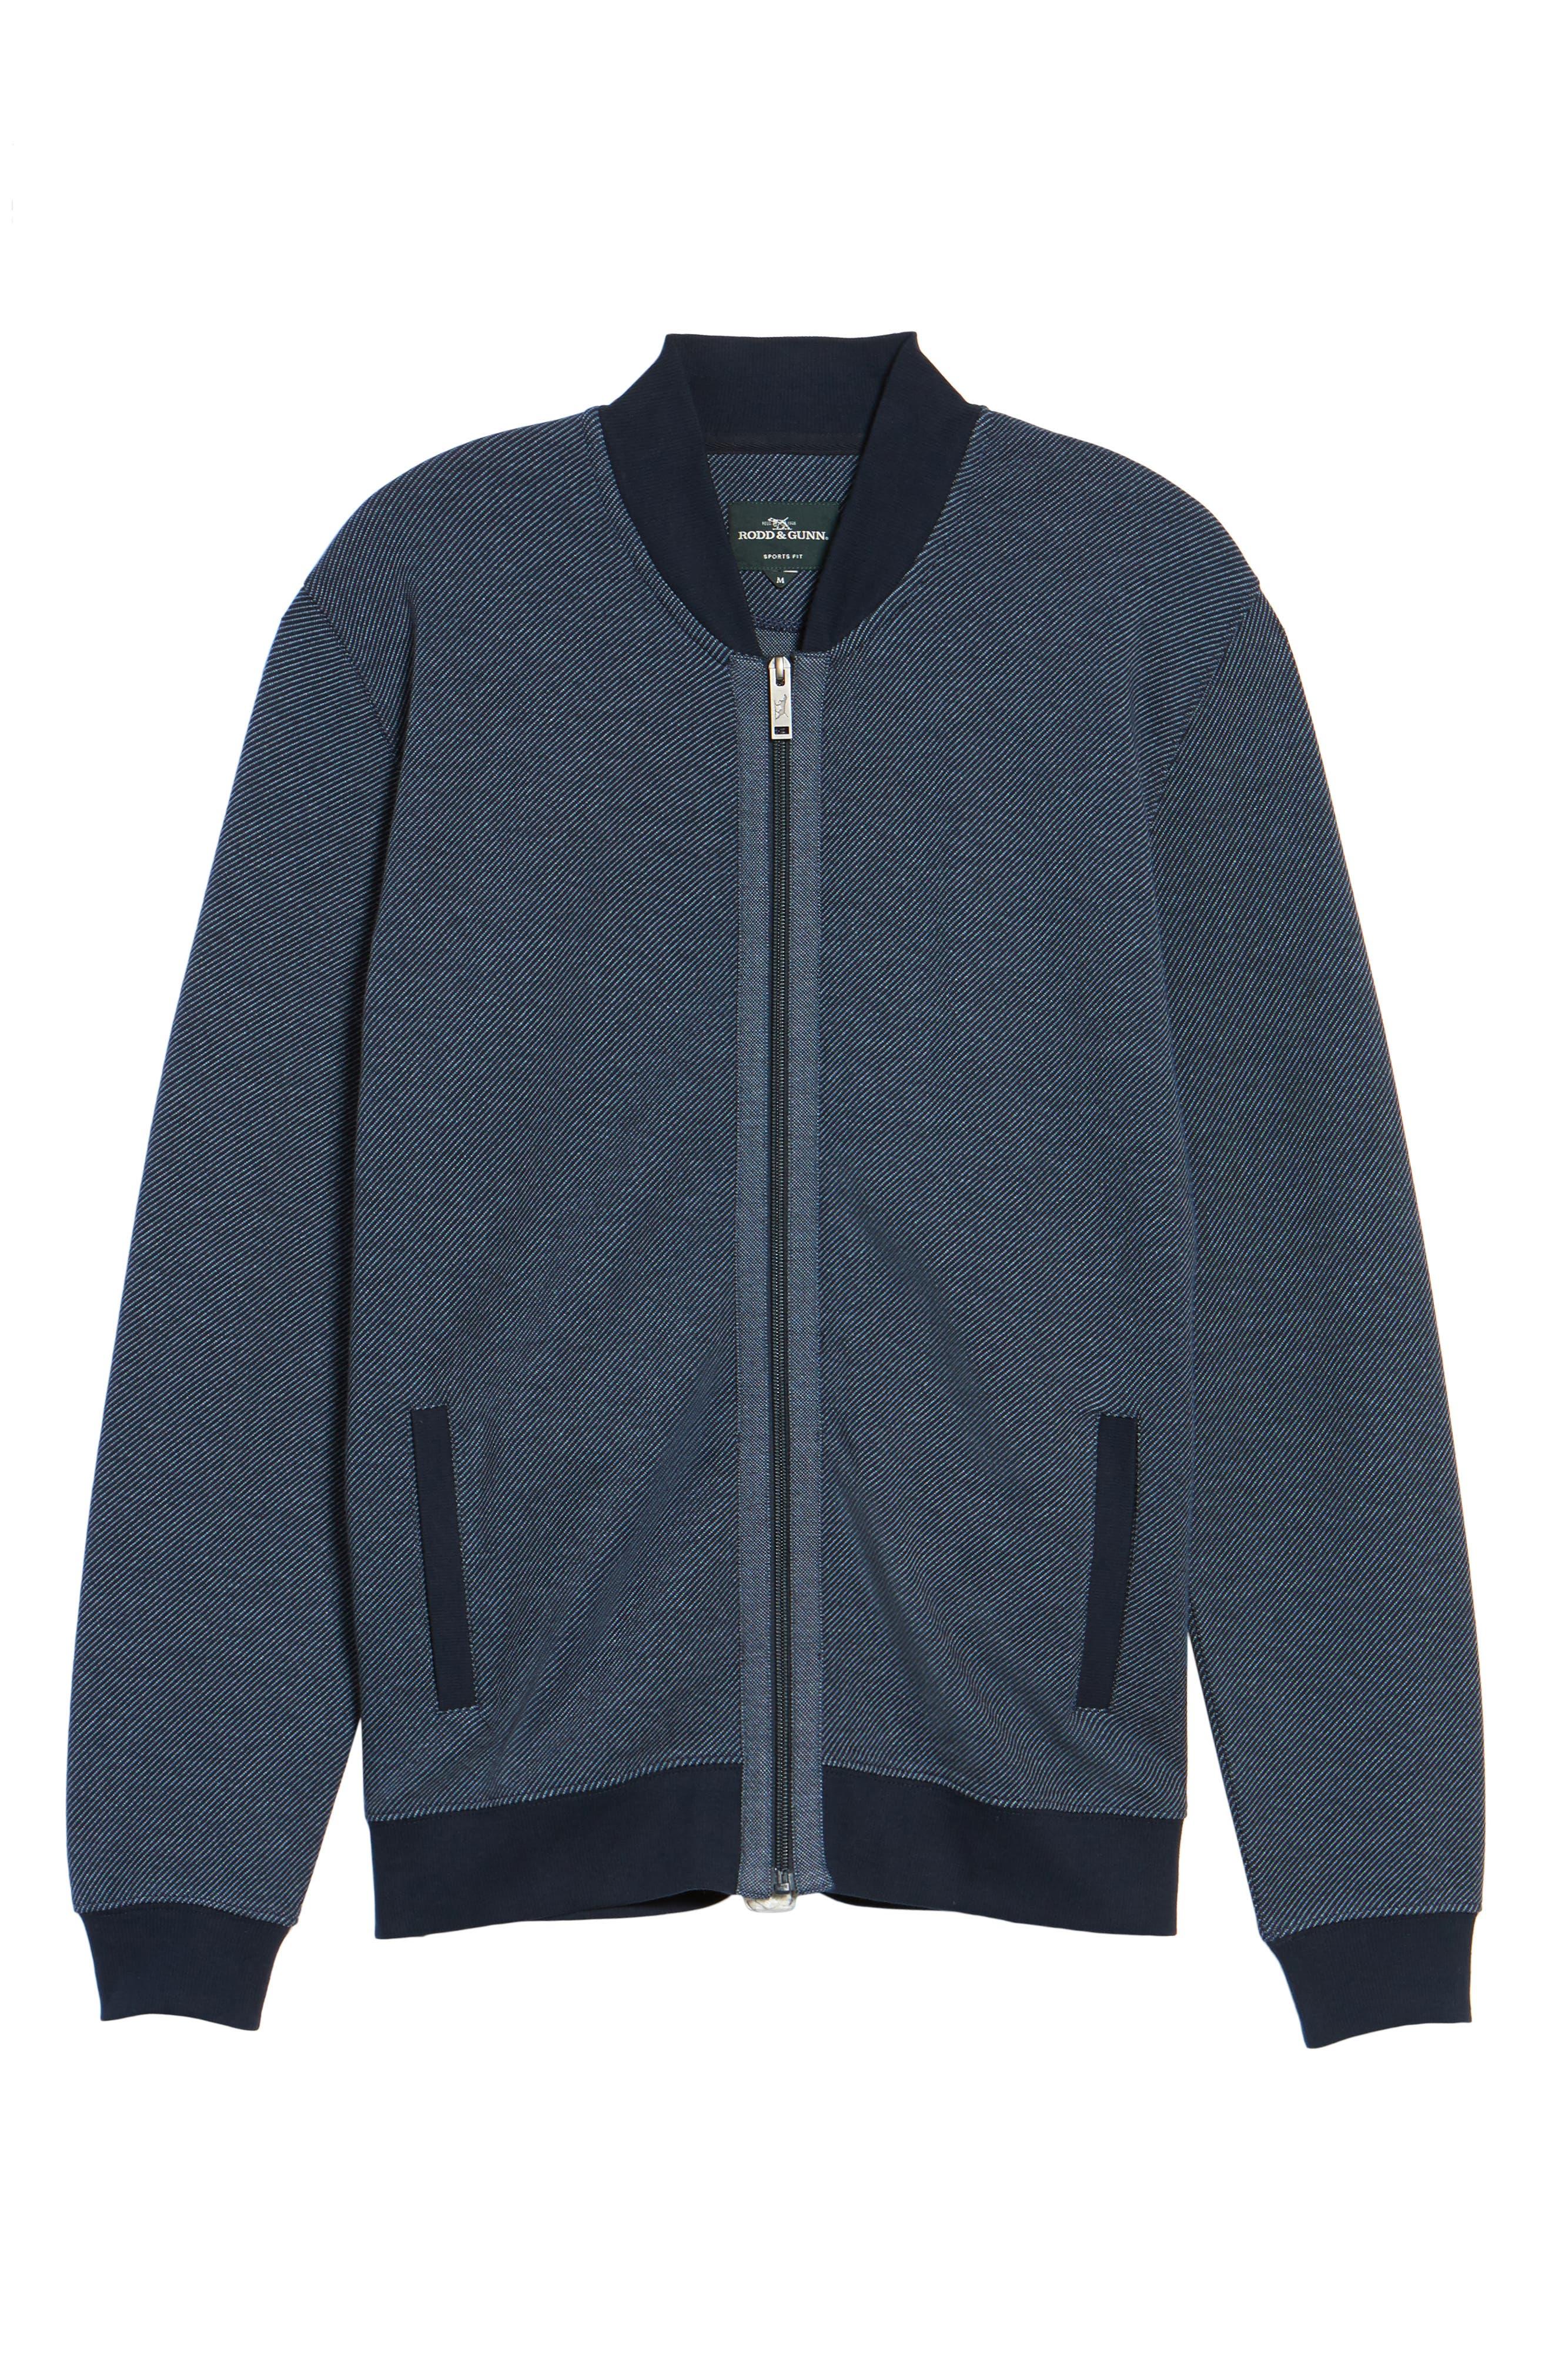 Alderson Ave Fleece Jacket,                             Alternate thumbnail 6, color,                             Navy